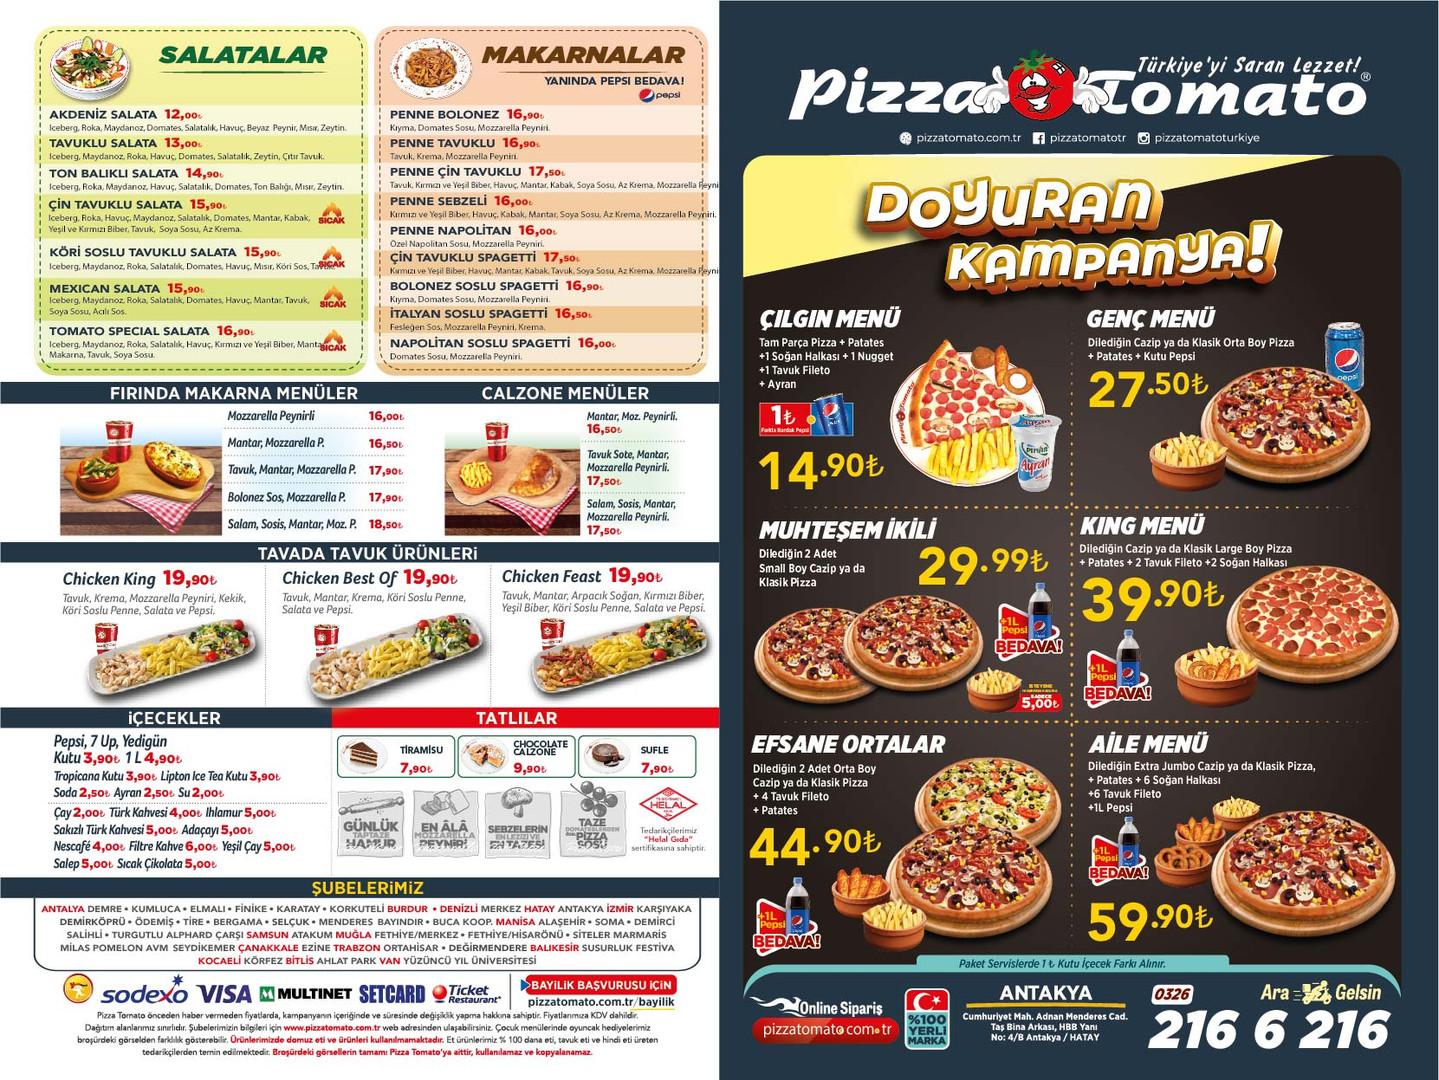 Pizza Tomato antakya menu on sayfa.jpg